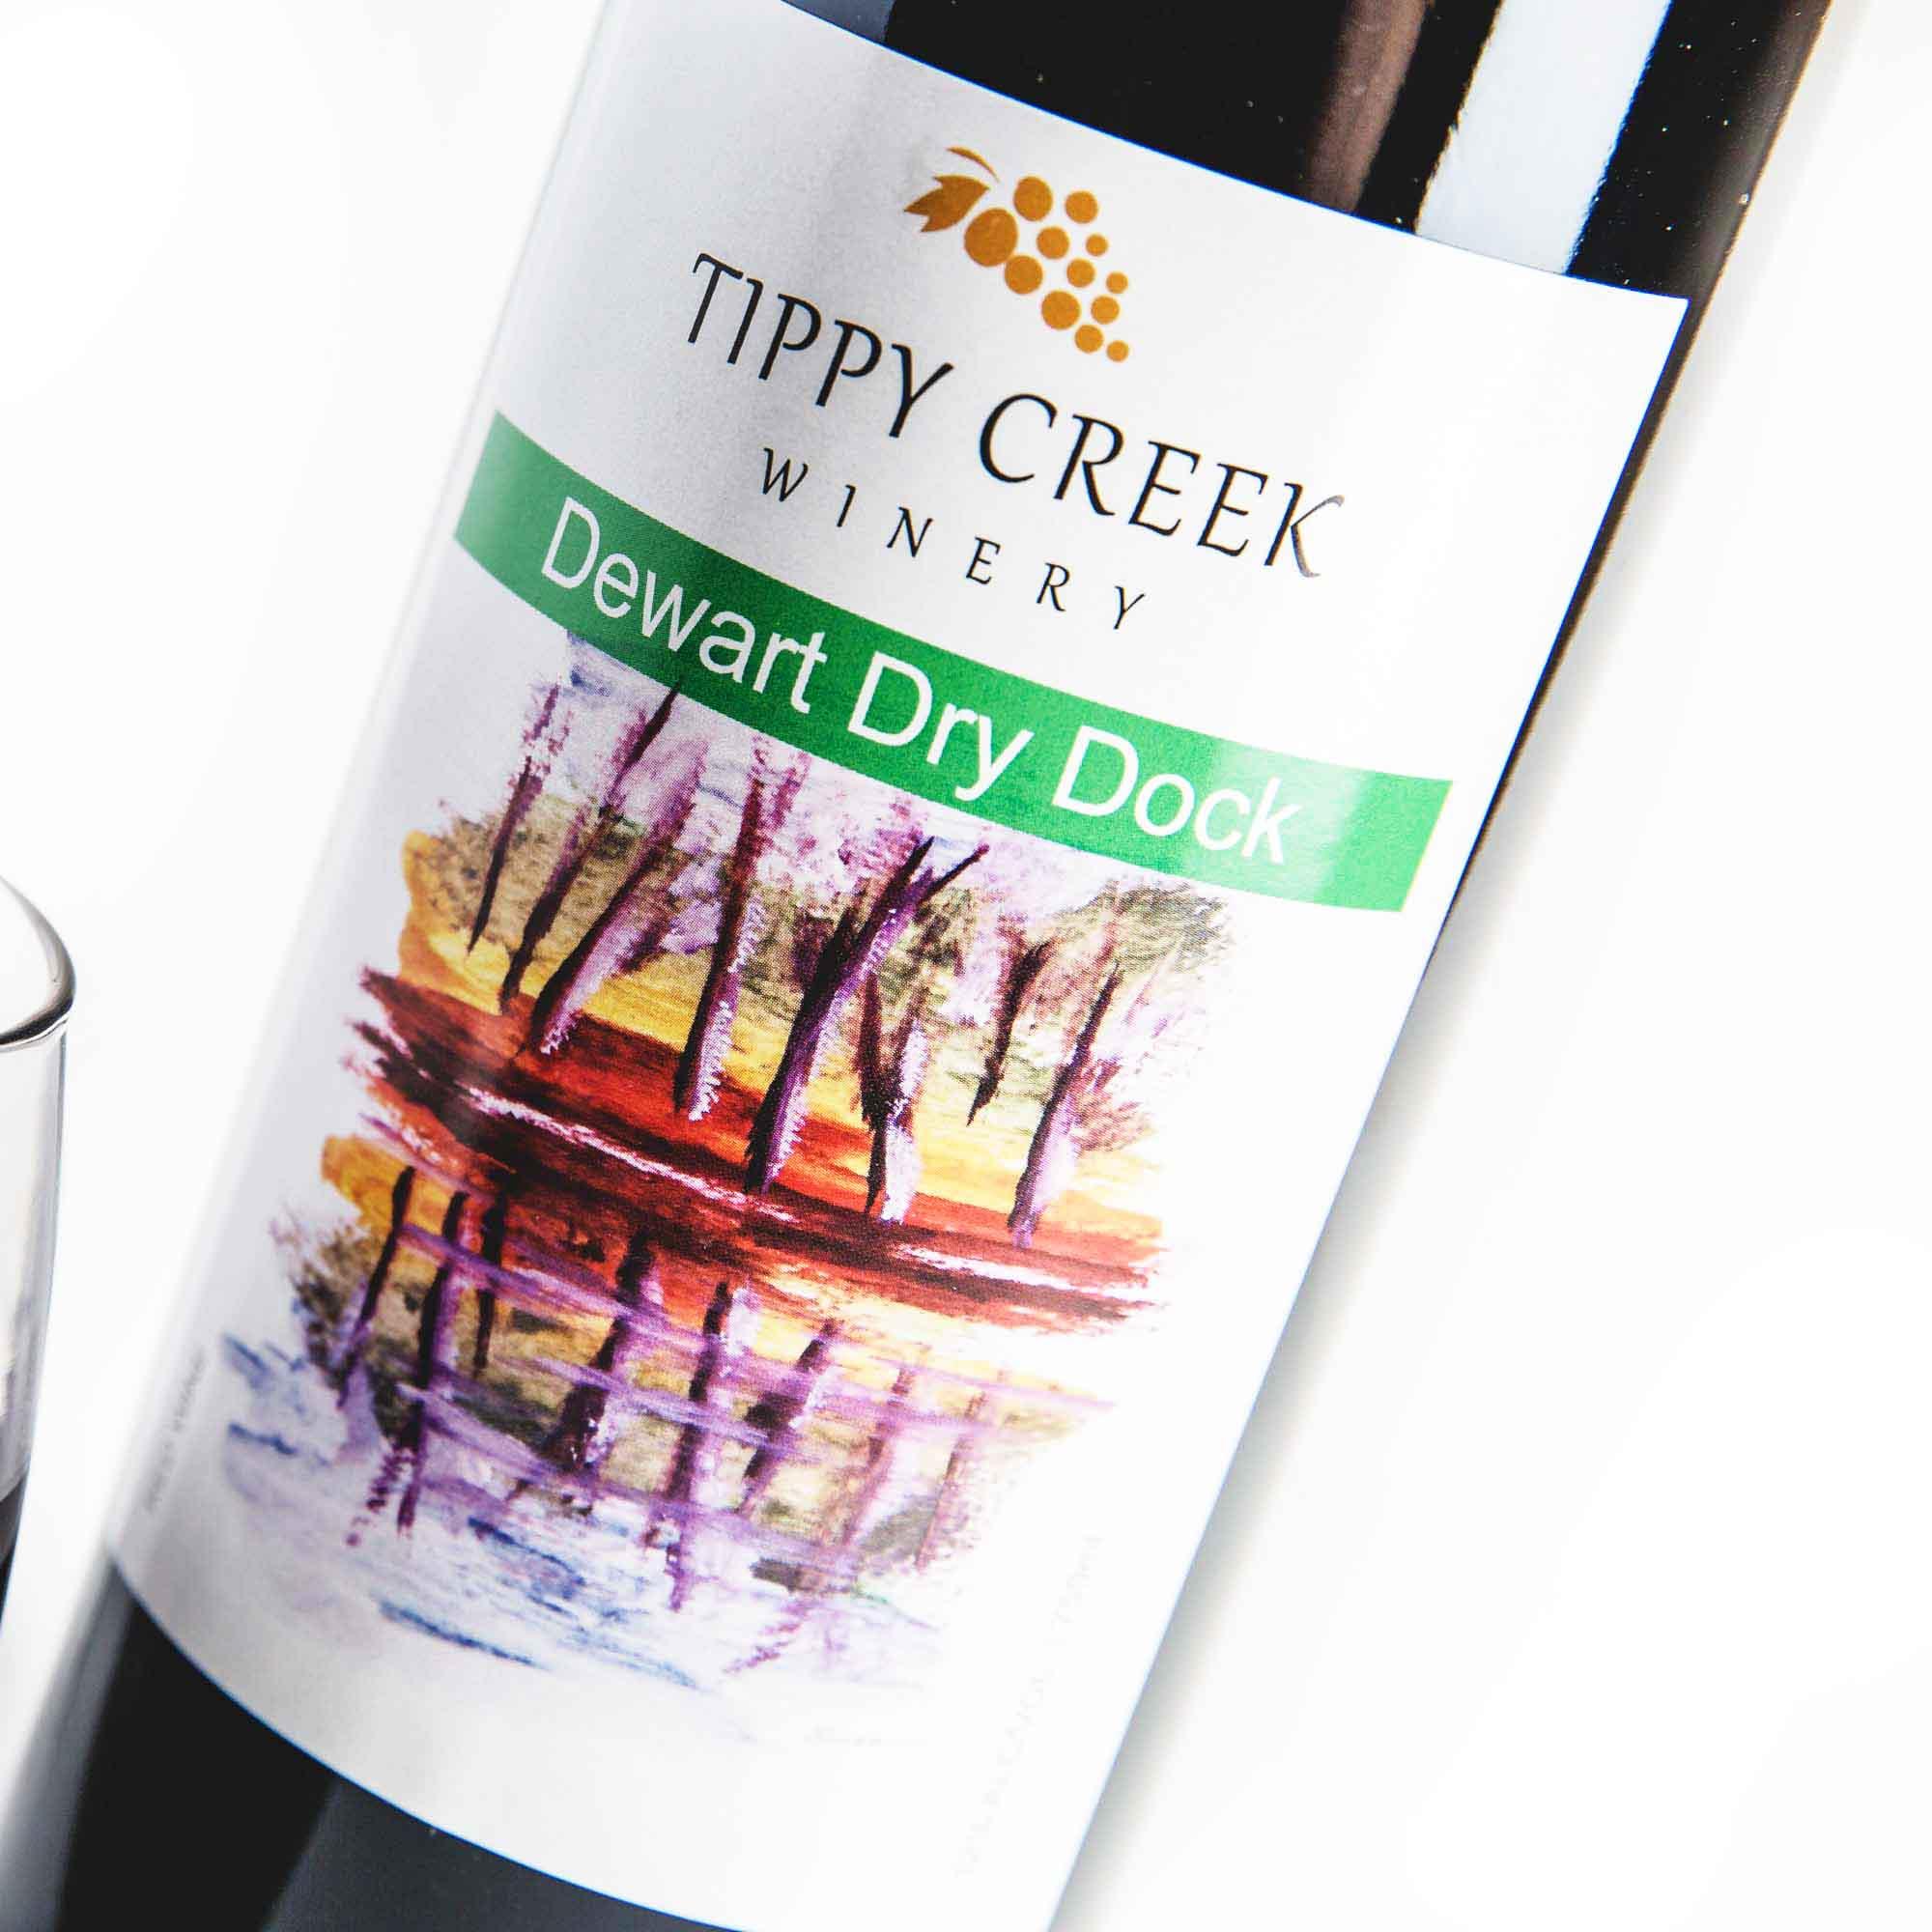 Dewart Dry Dock Red Wine Tippy Creek Winery